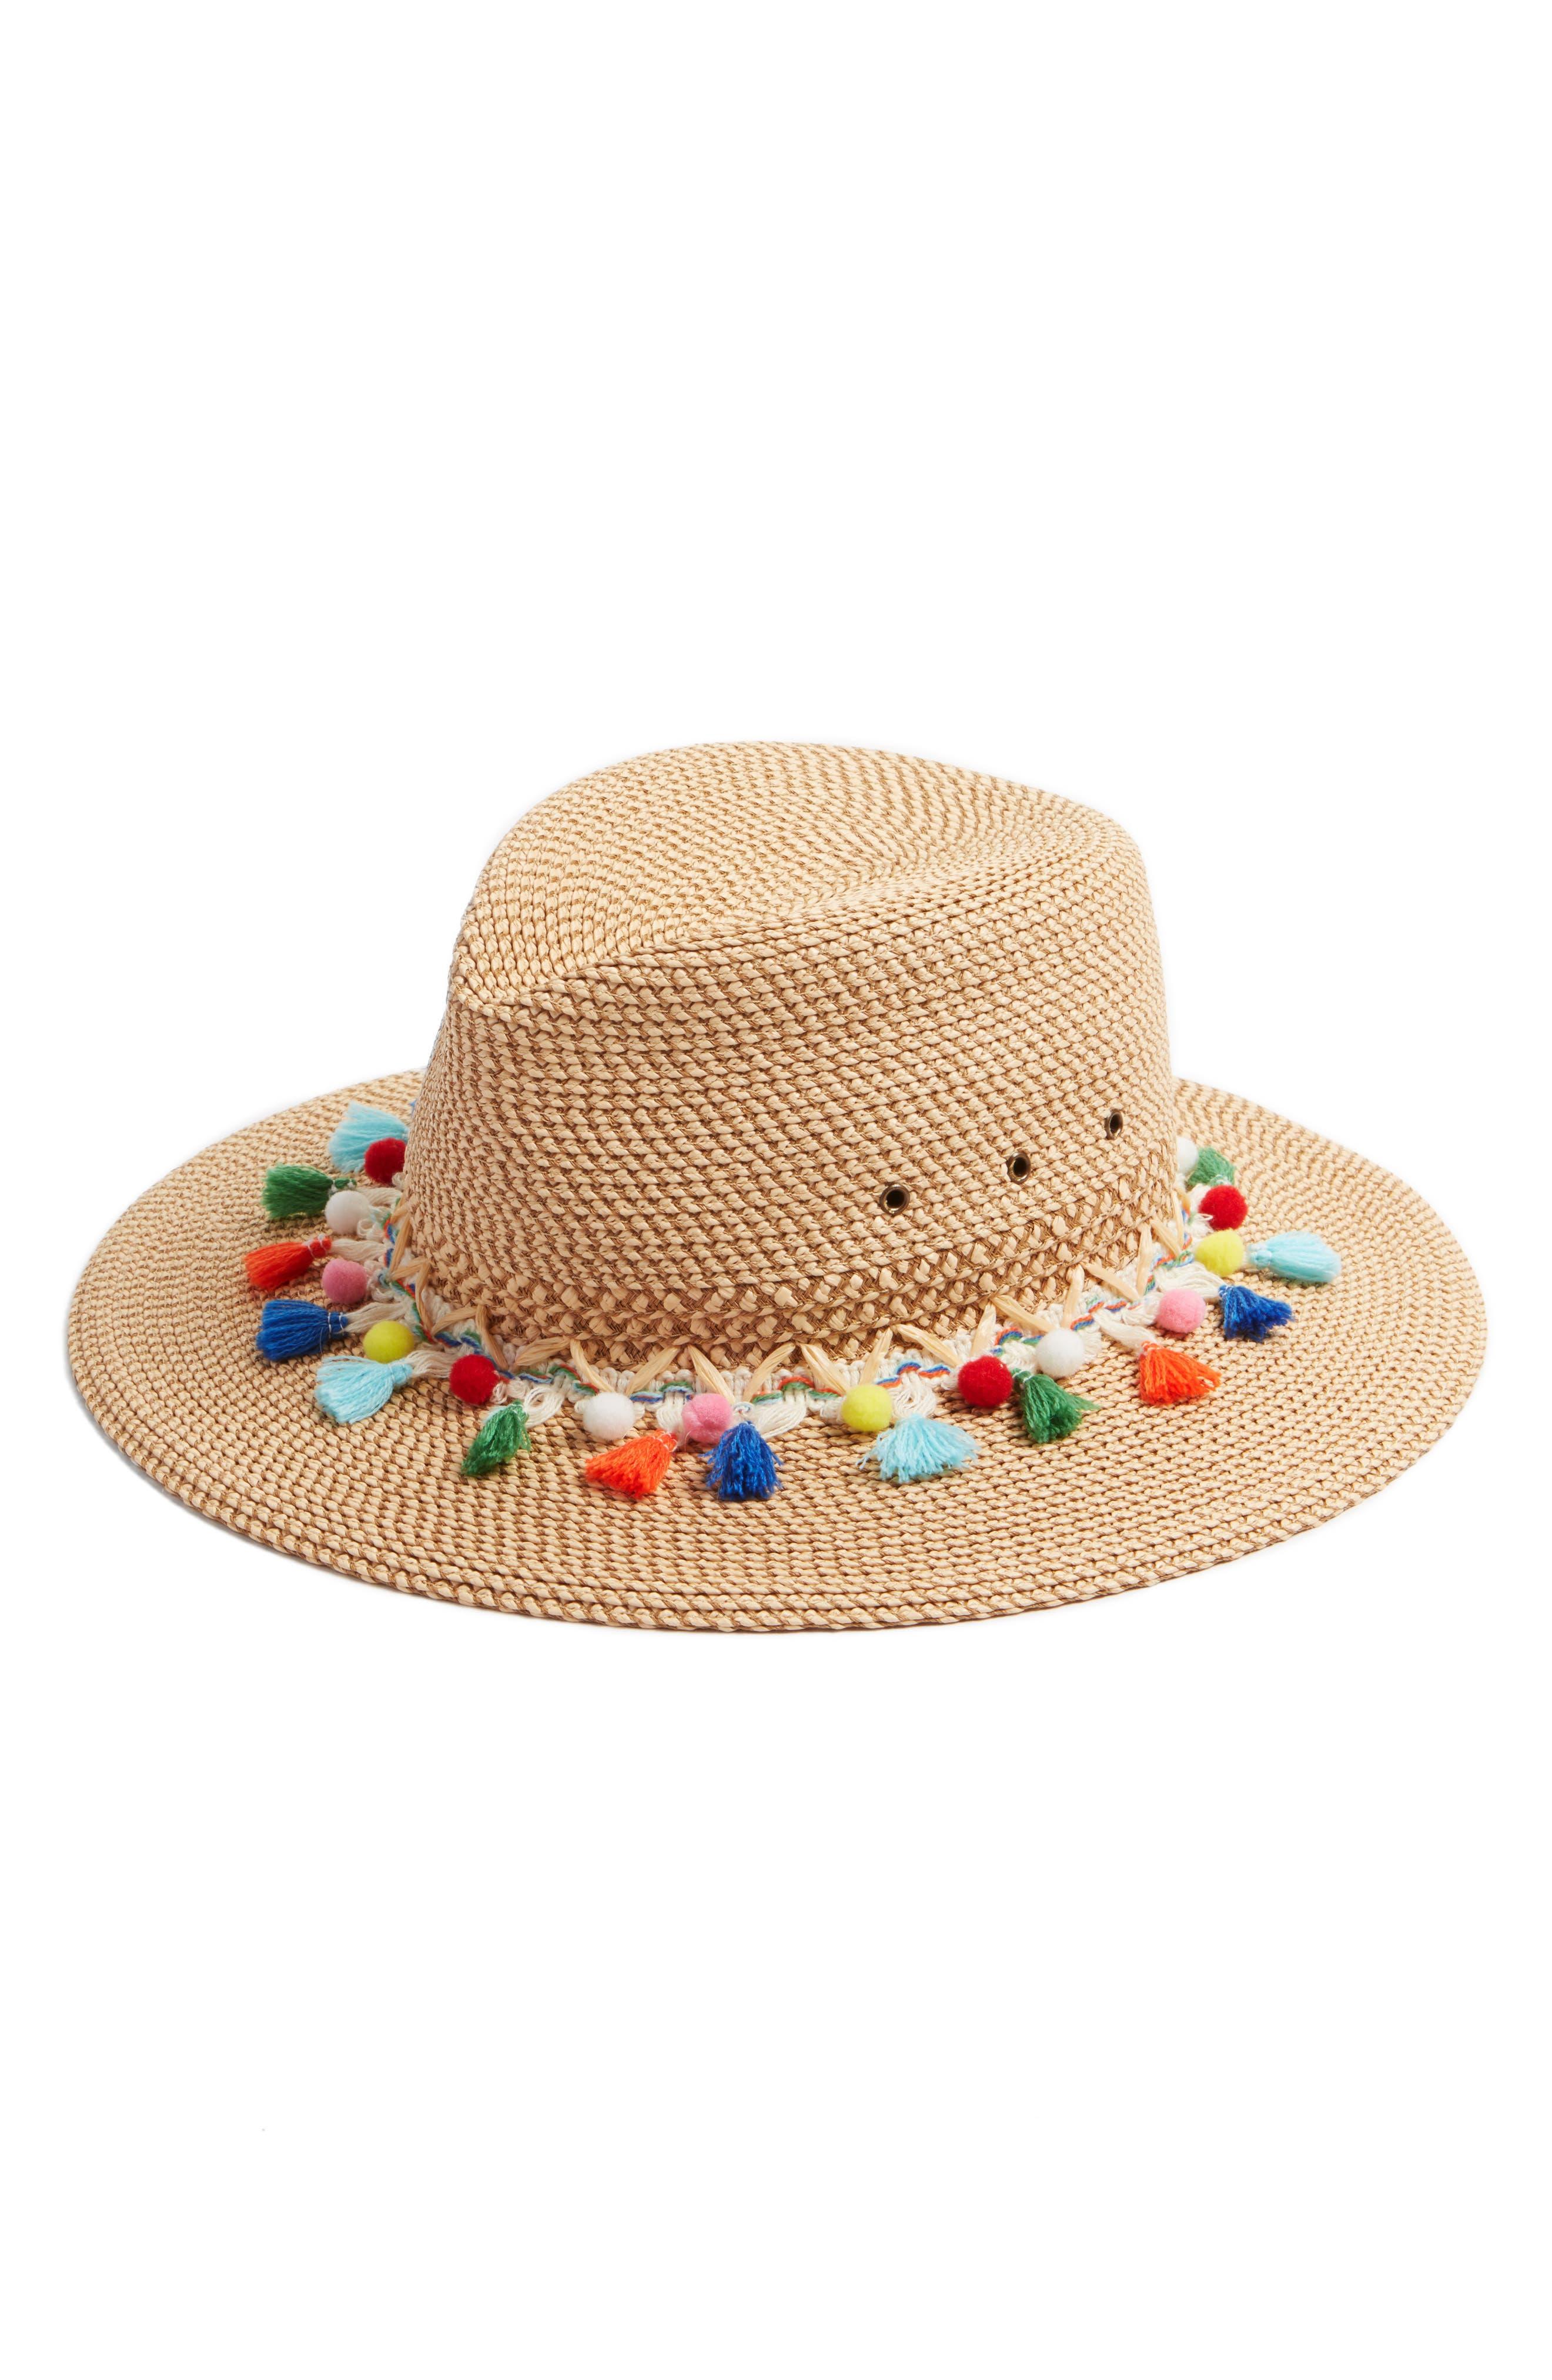 Bahia Sun Hat,                             Main thumbnail 1, color,                             250